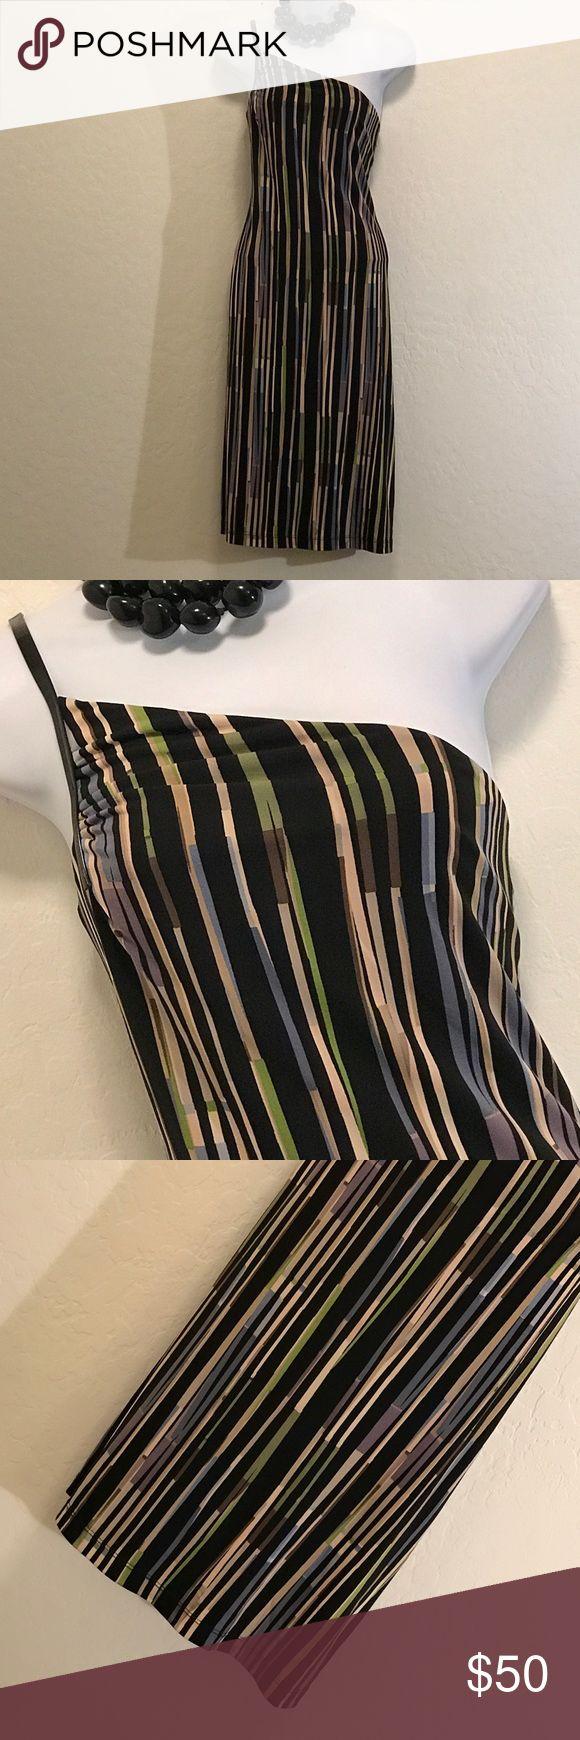 👗NWOT BCBGMaxAzria One Strap Dress Never Worn, Great Color & Cool Print, Stretch. BCBGMaxAzria Dresses One Shoulder